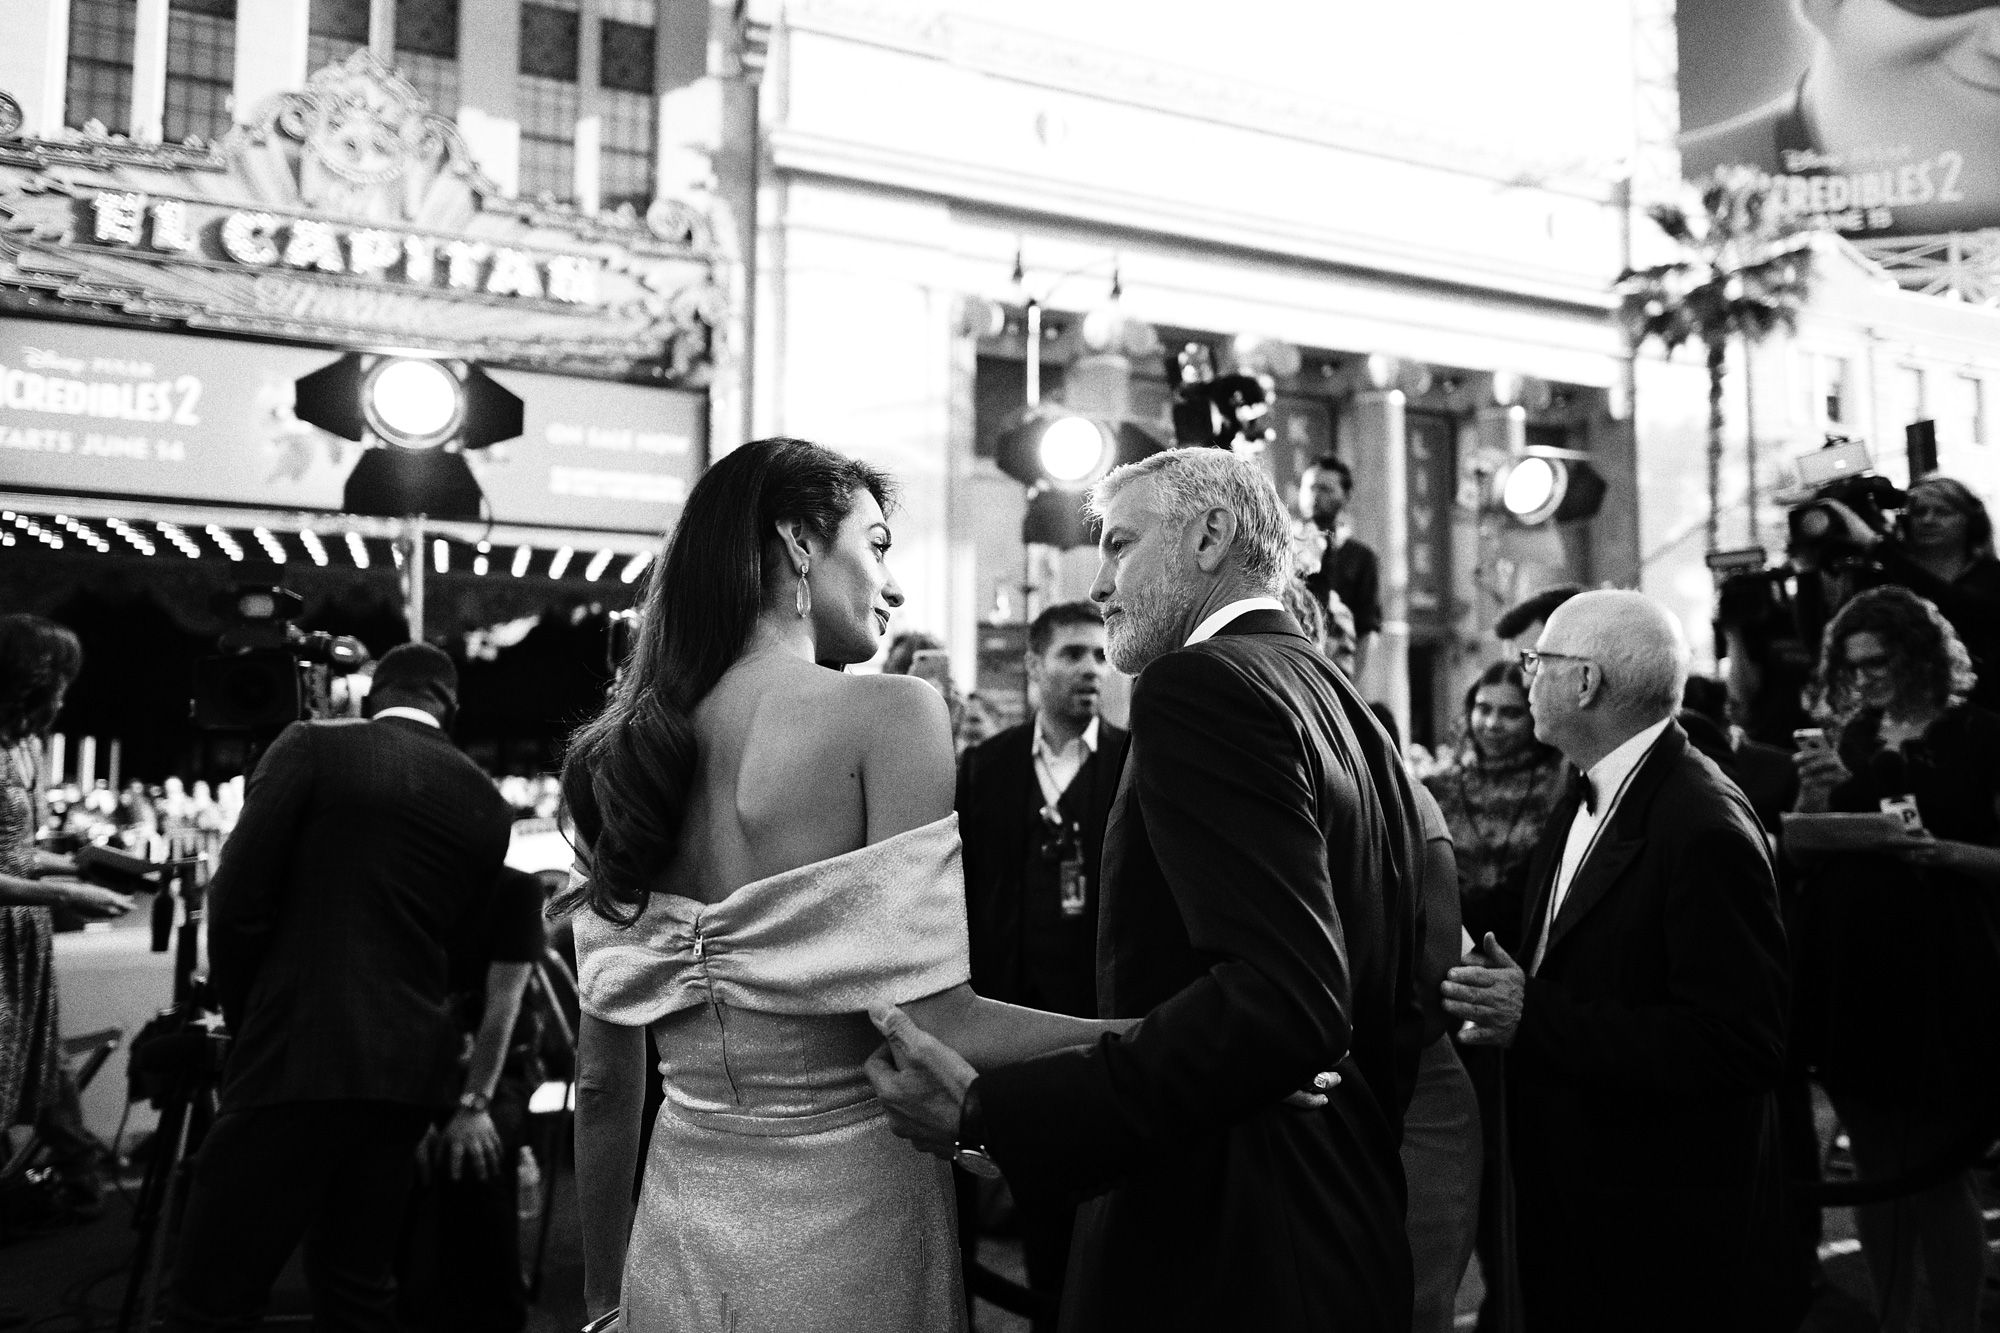 Matrimonio In Vista : Katy perry e orlando bloom matrimonio in vista la proposta nel